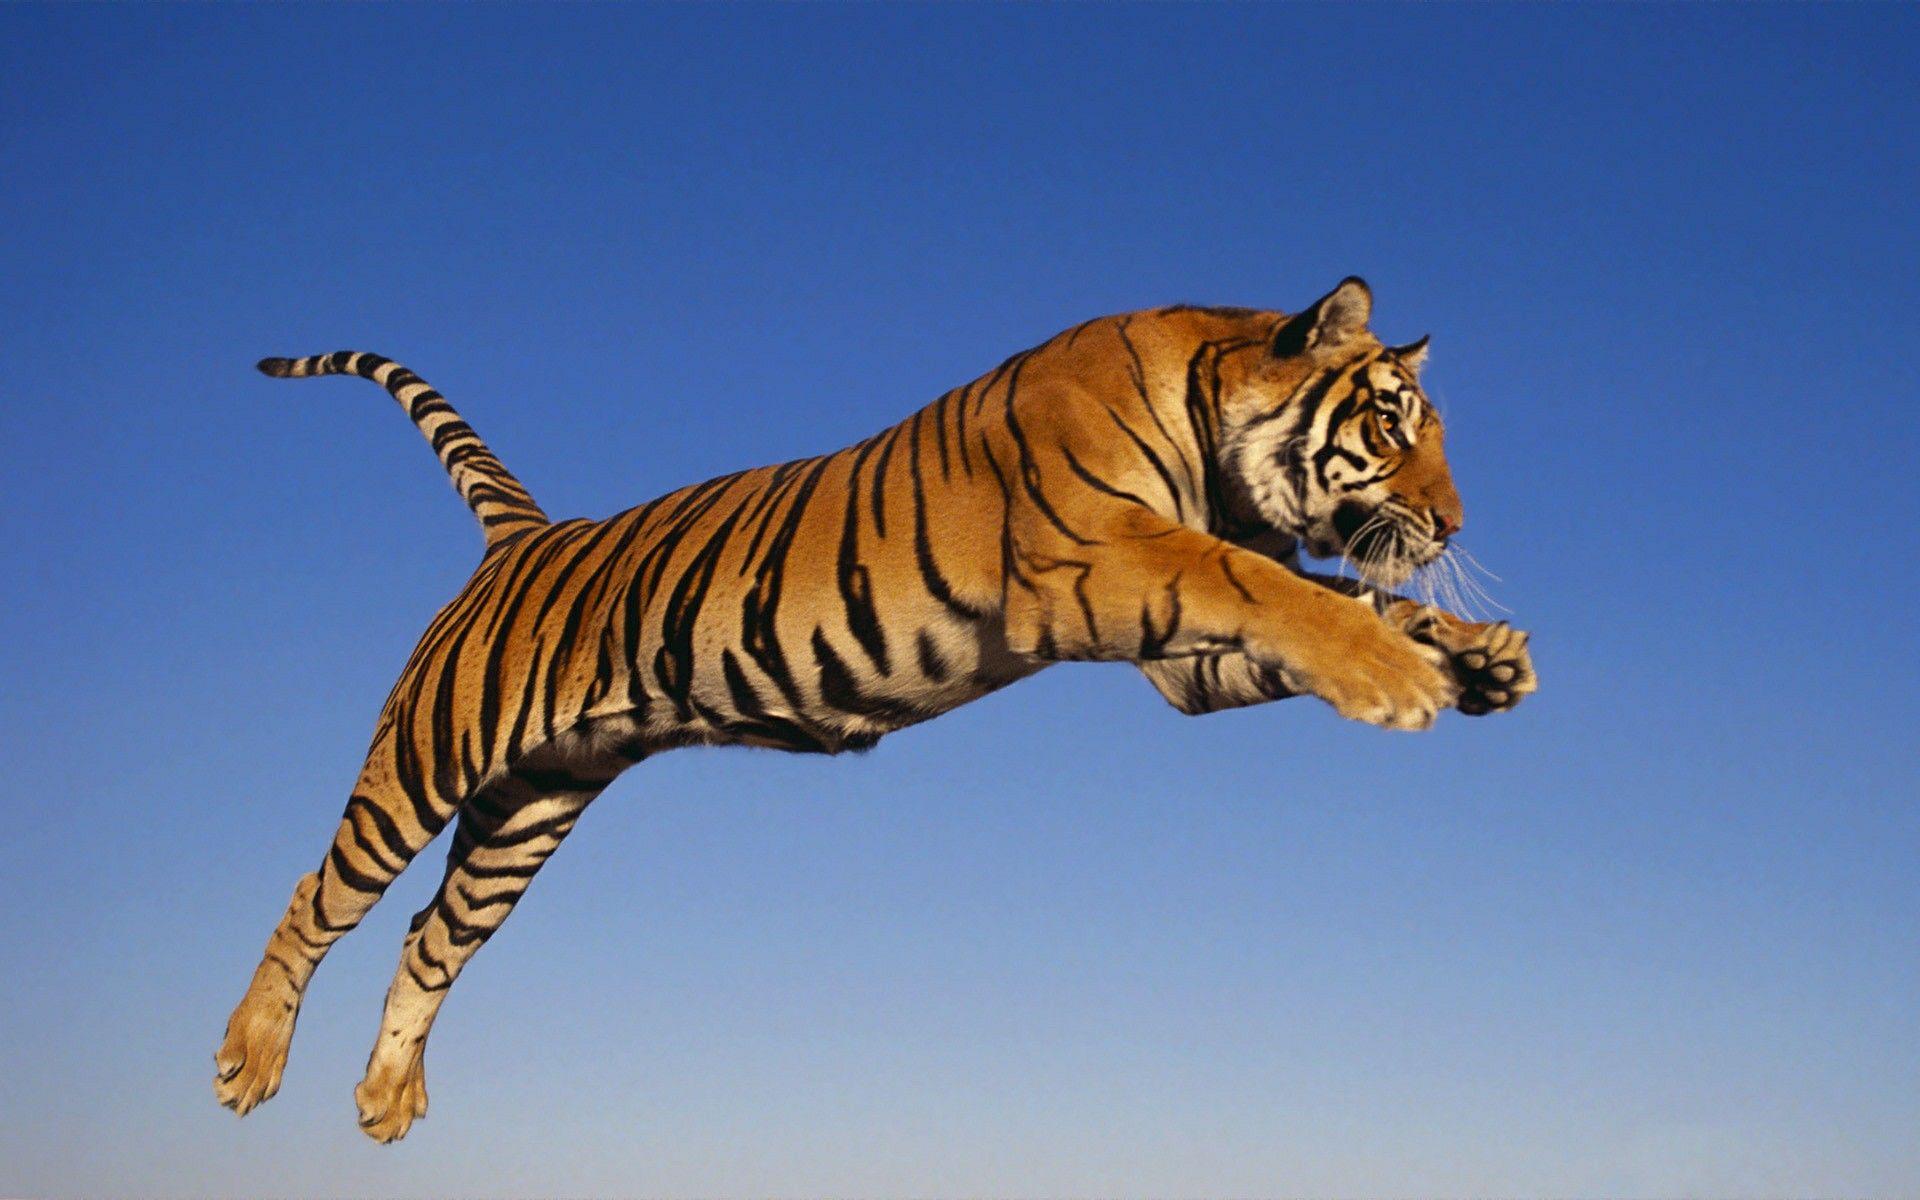 japan tigers hd wallpapers tiger wallpaper for desktop | hd